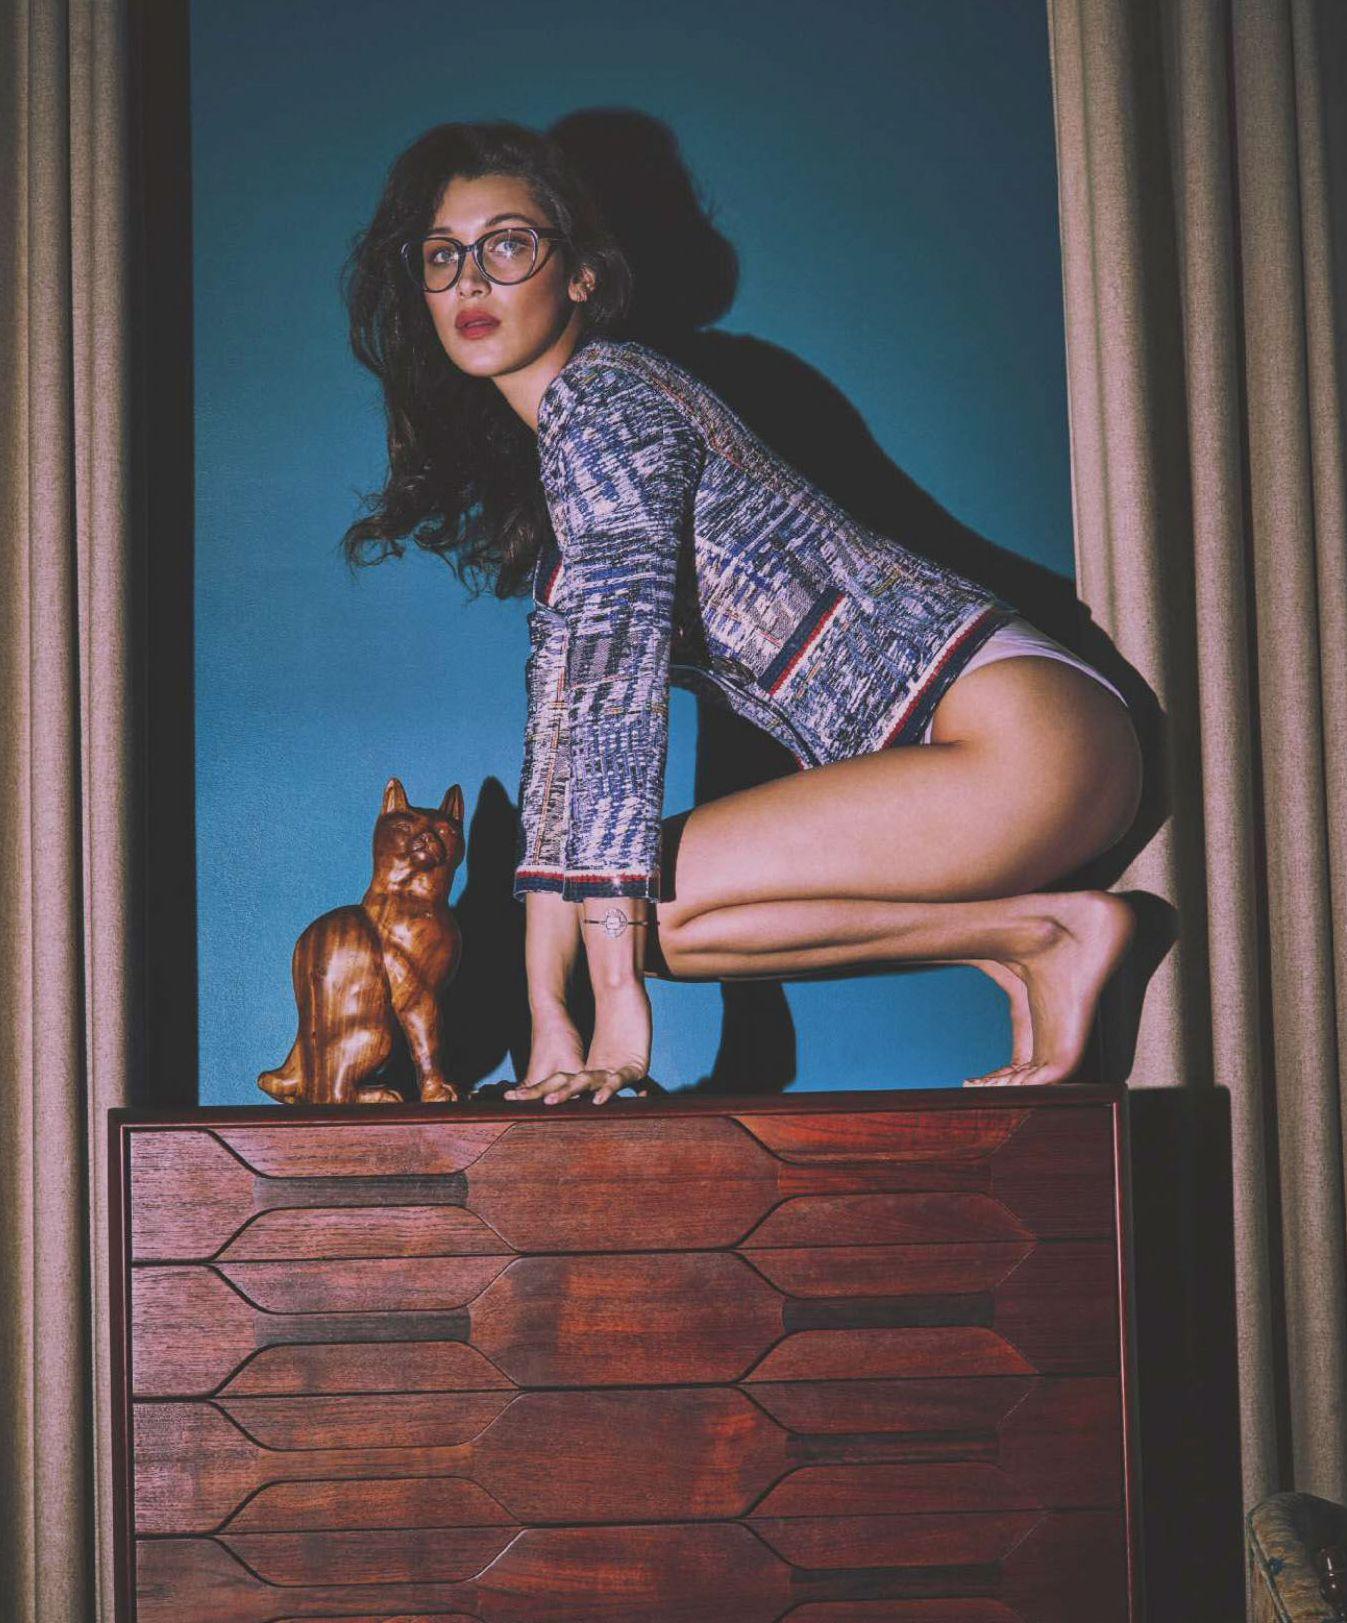 Bella Hadid by Guy Aroch for Harper's Bazaar Spain April 2016